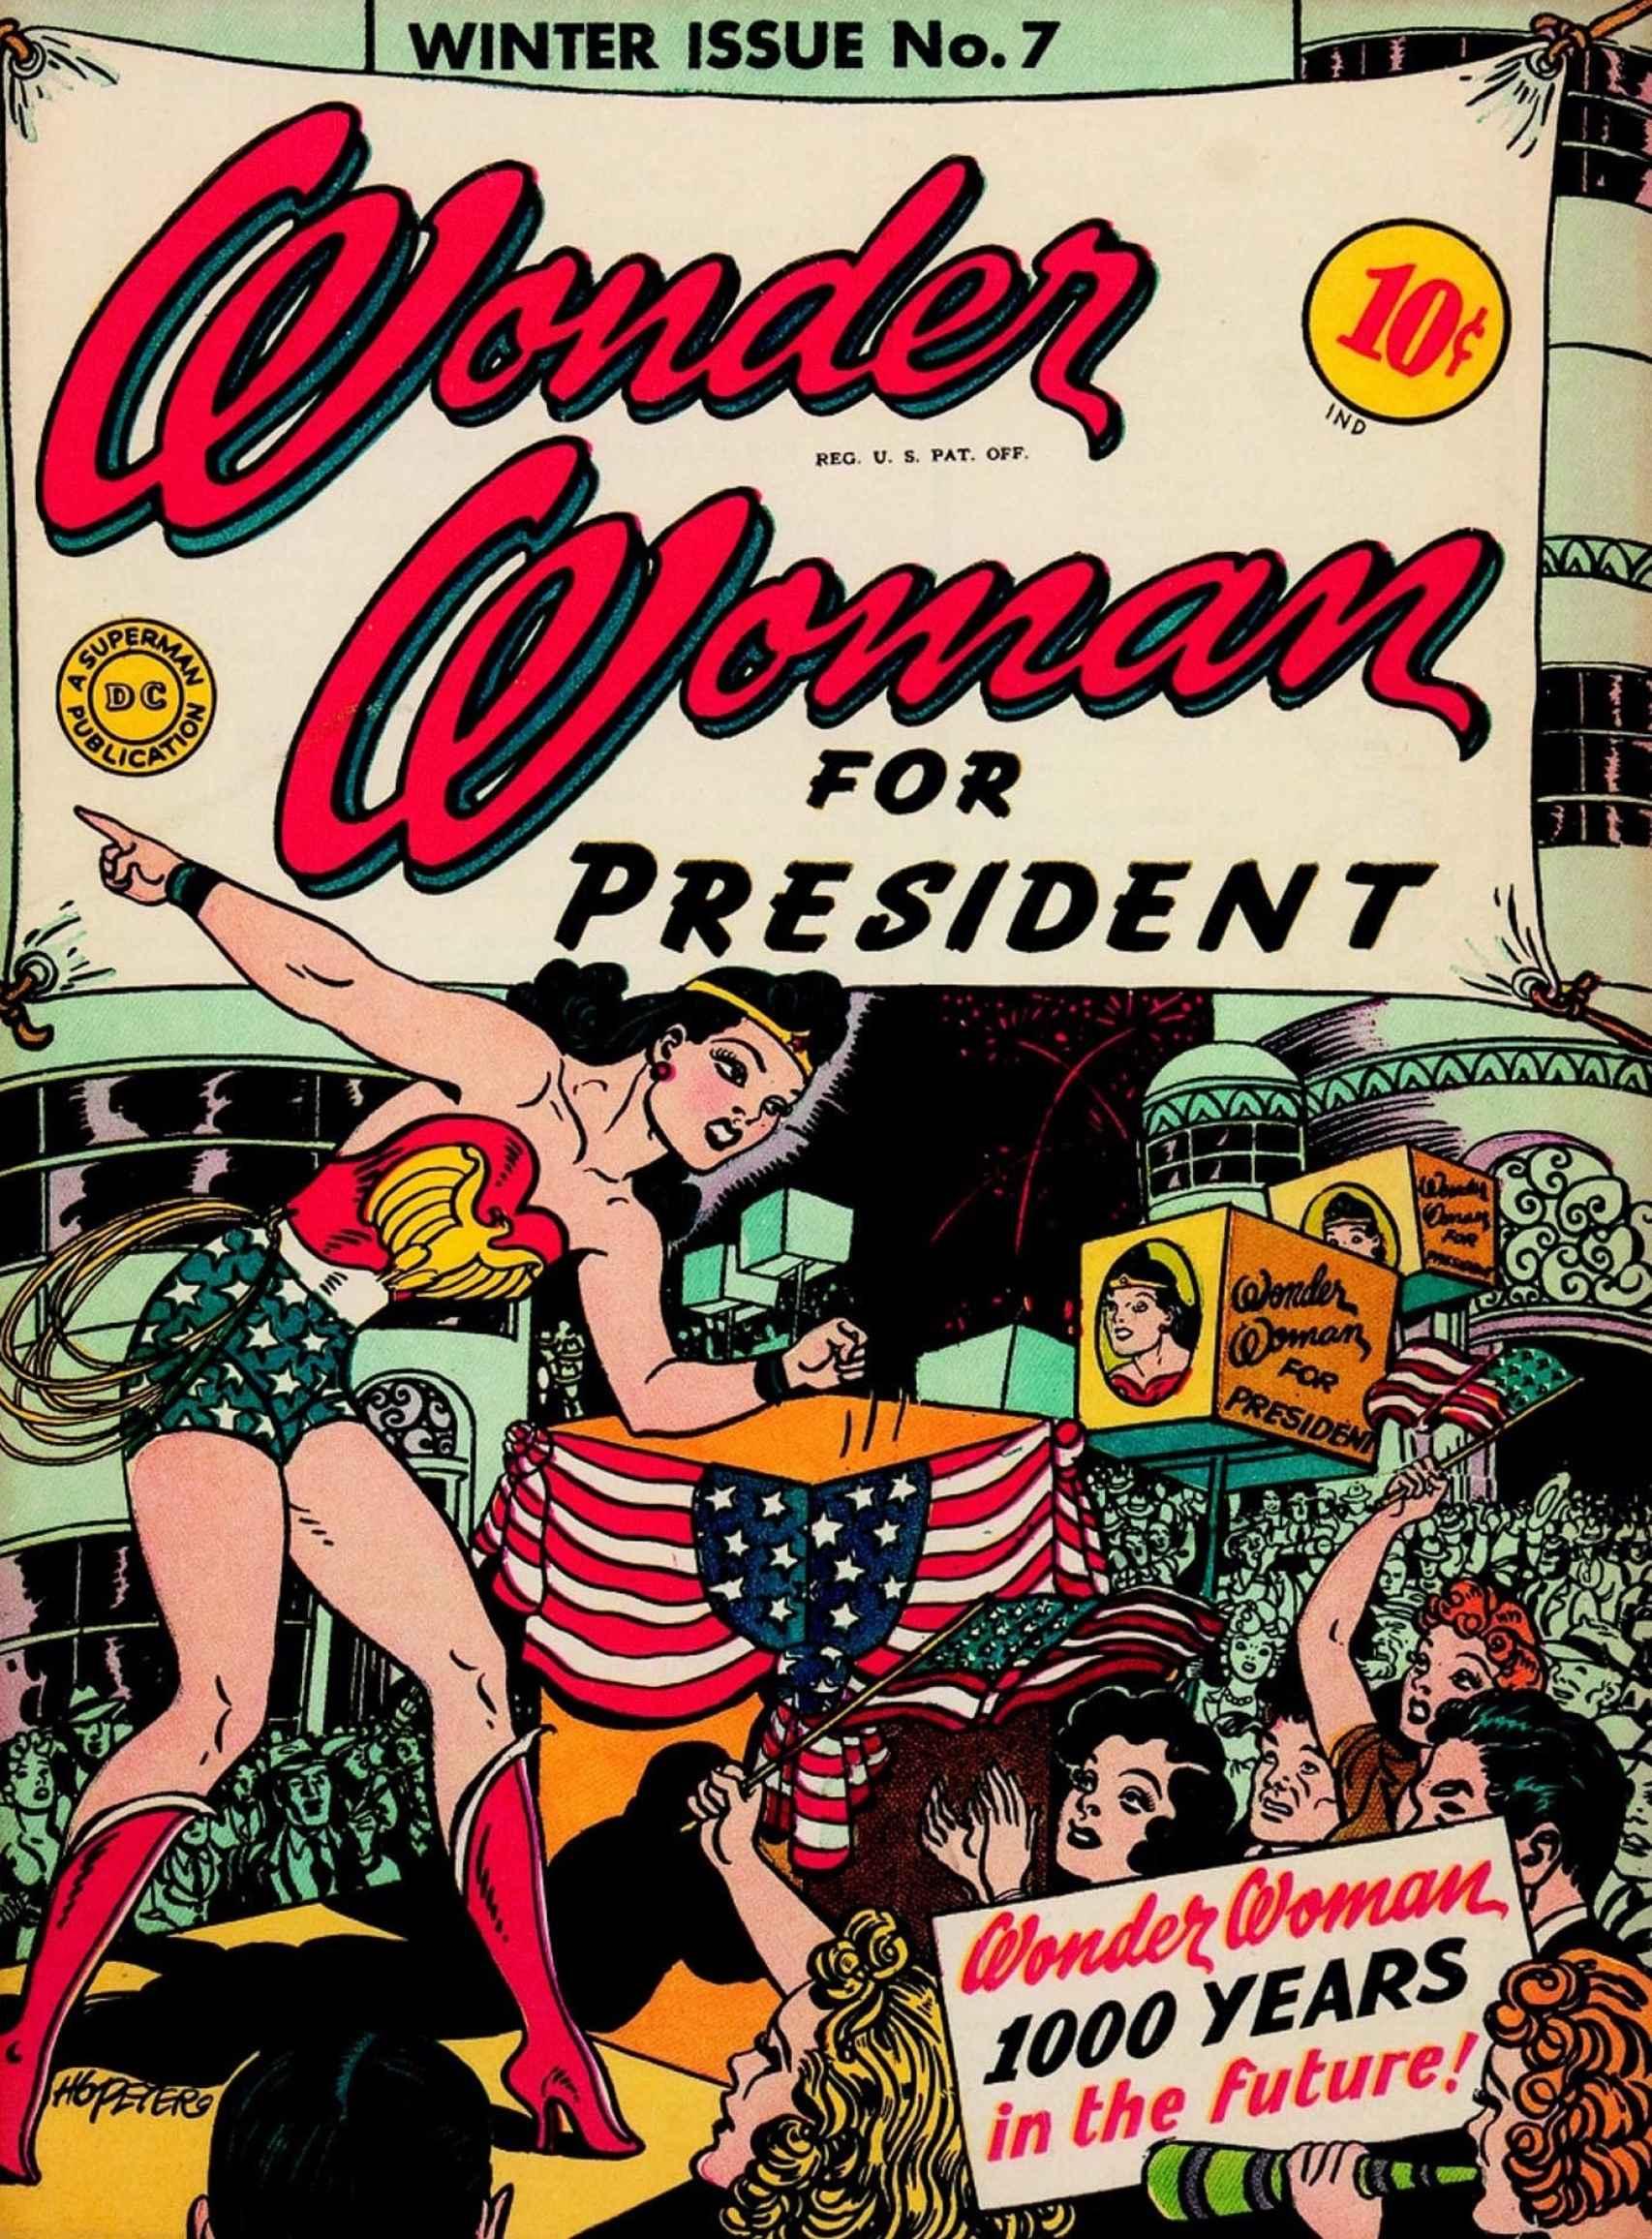 Wonder Woman for President (diciembre 1943).